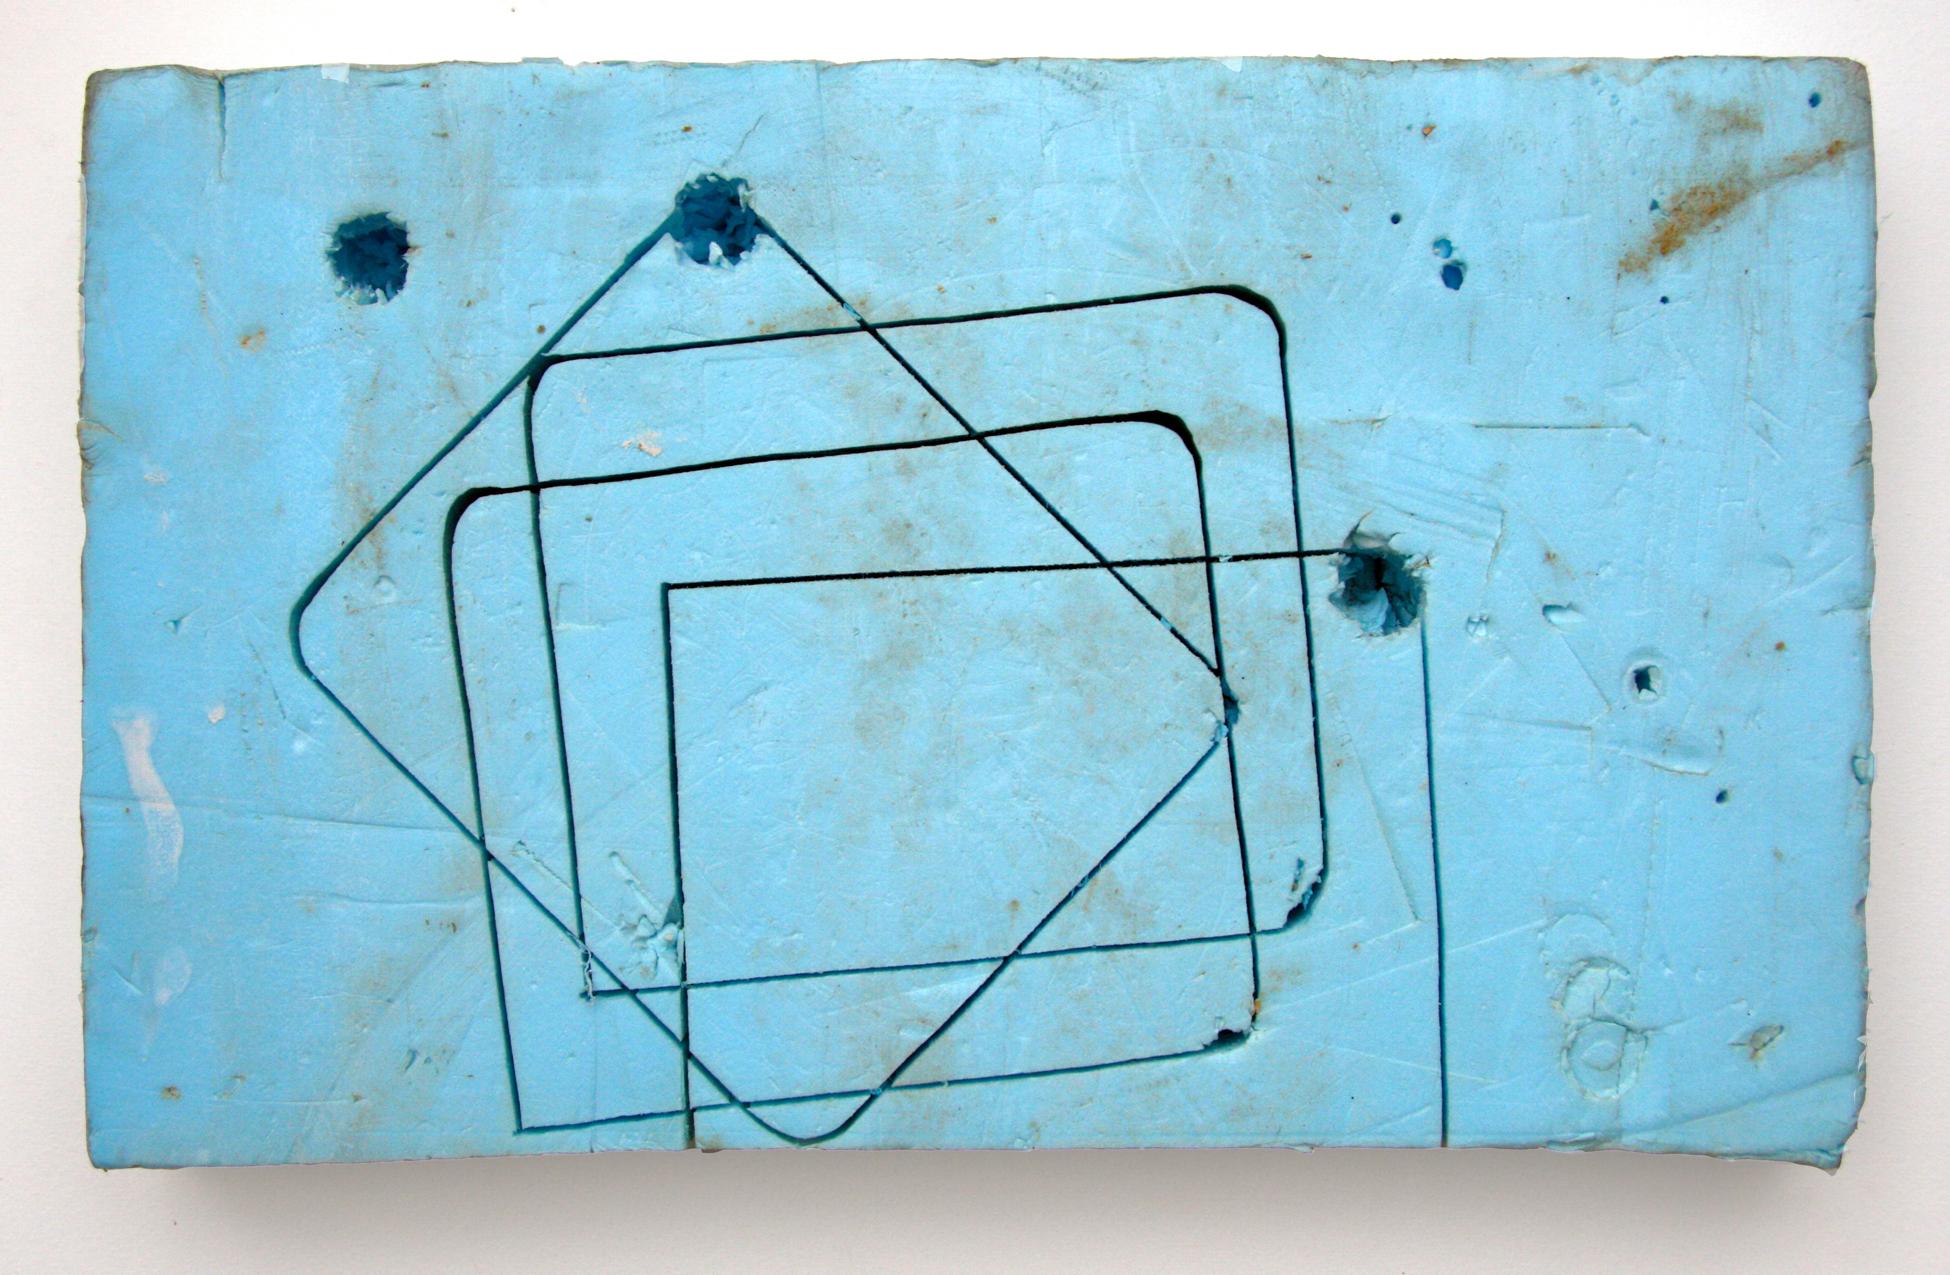 Jigsaw Drawing, 2014